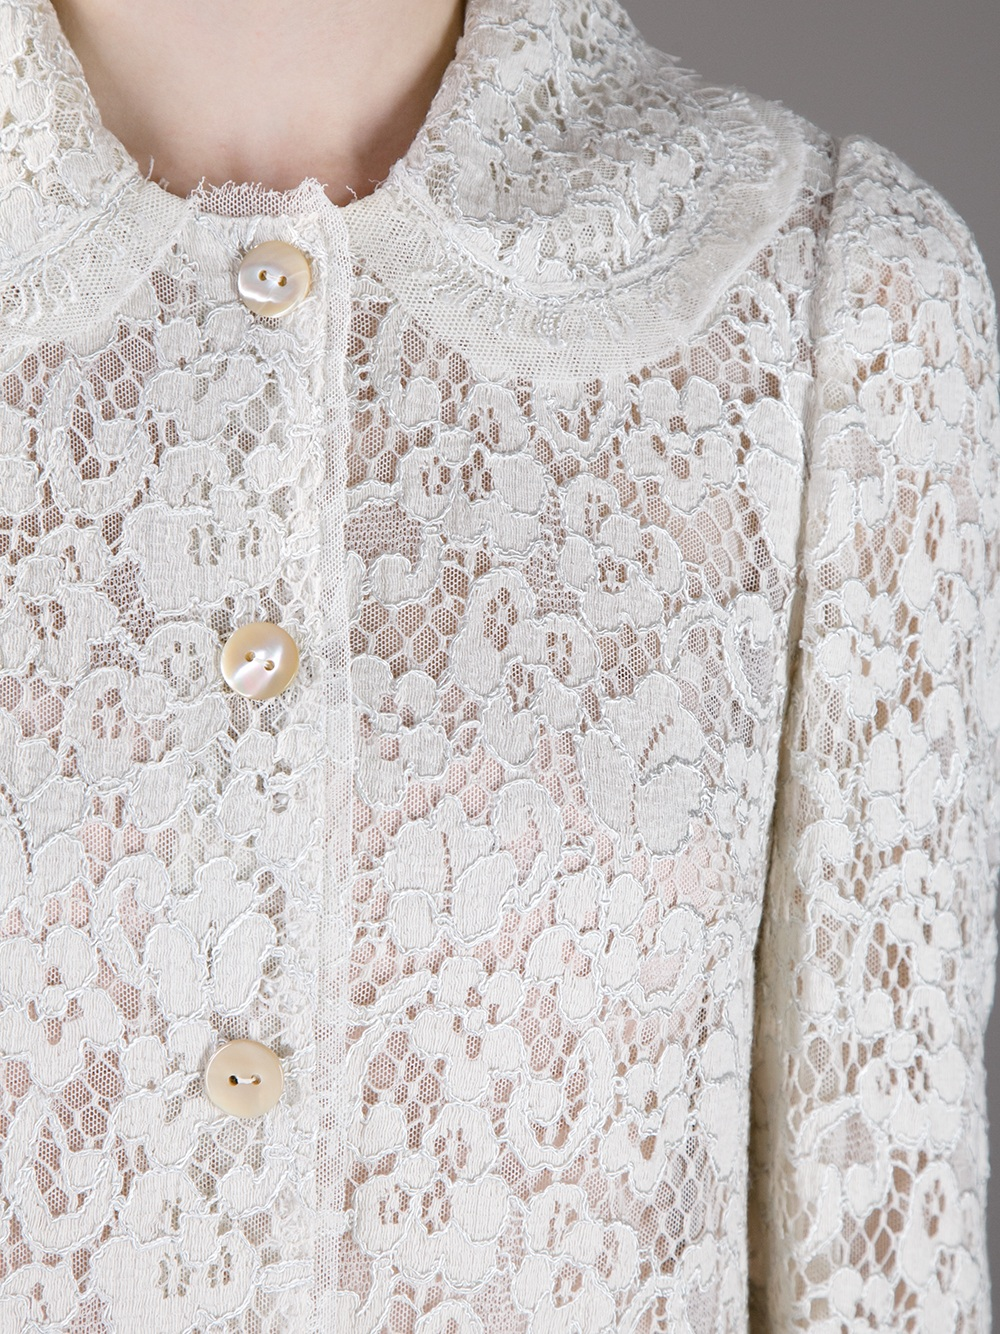 4c52aa82349 Dolce & Gabbana Lace Dress Coat in White - Lyst